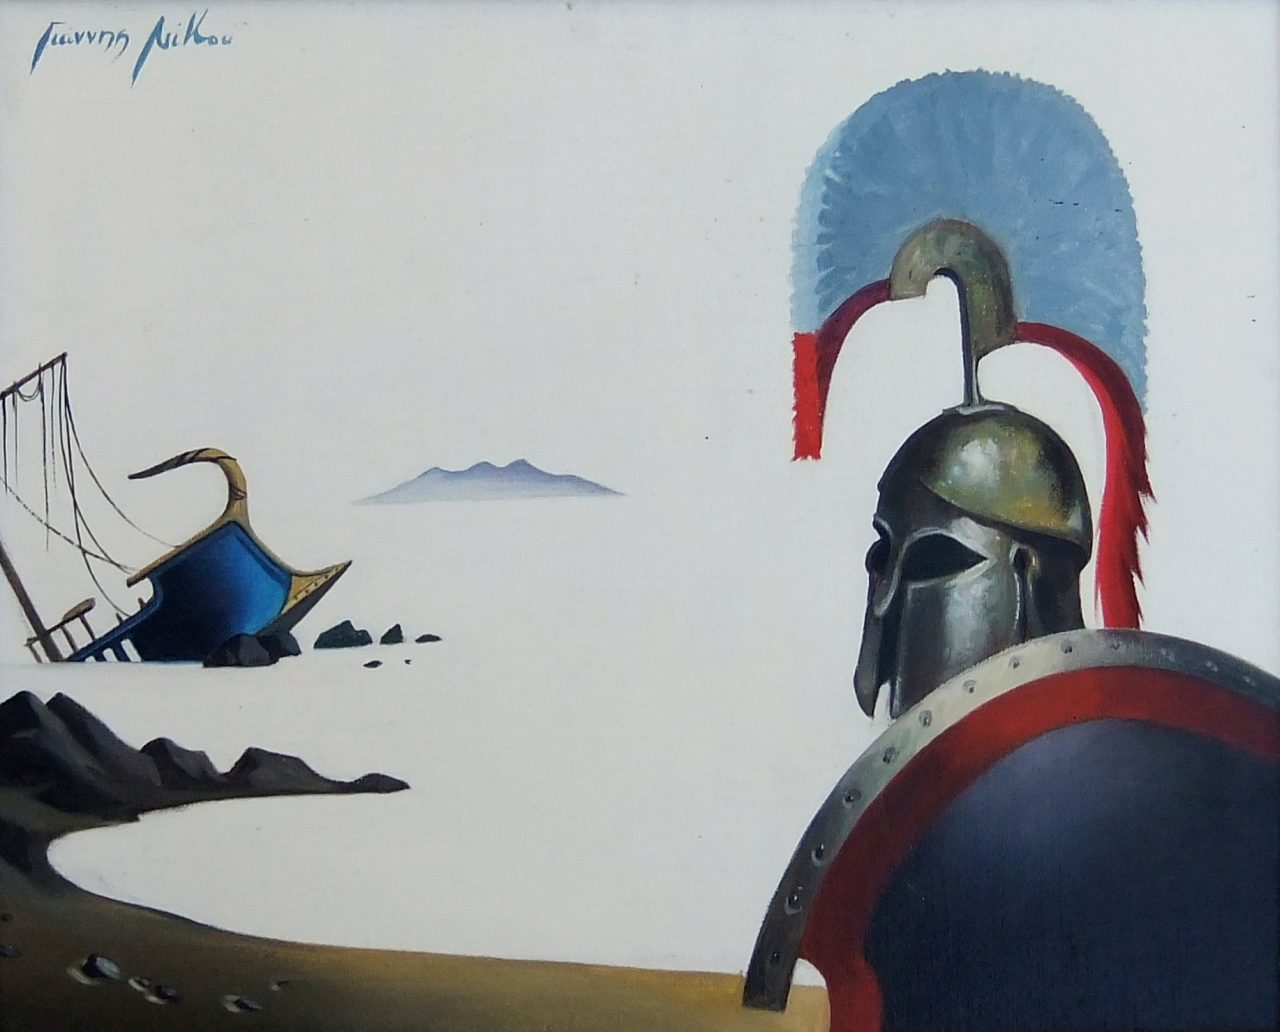 072. NIKOU Iannis (1943)